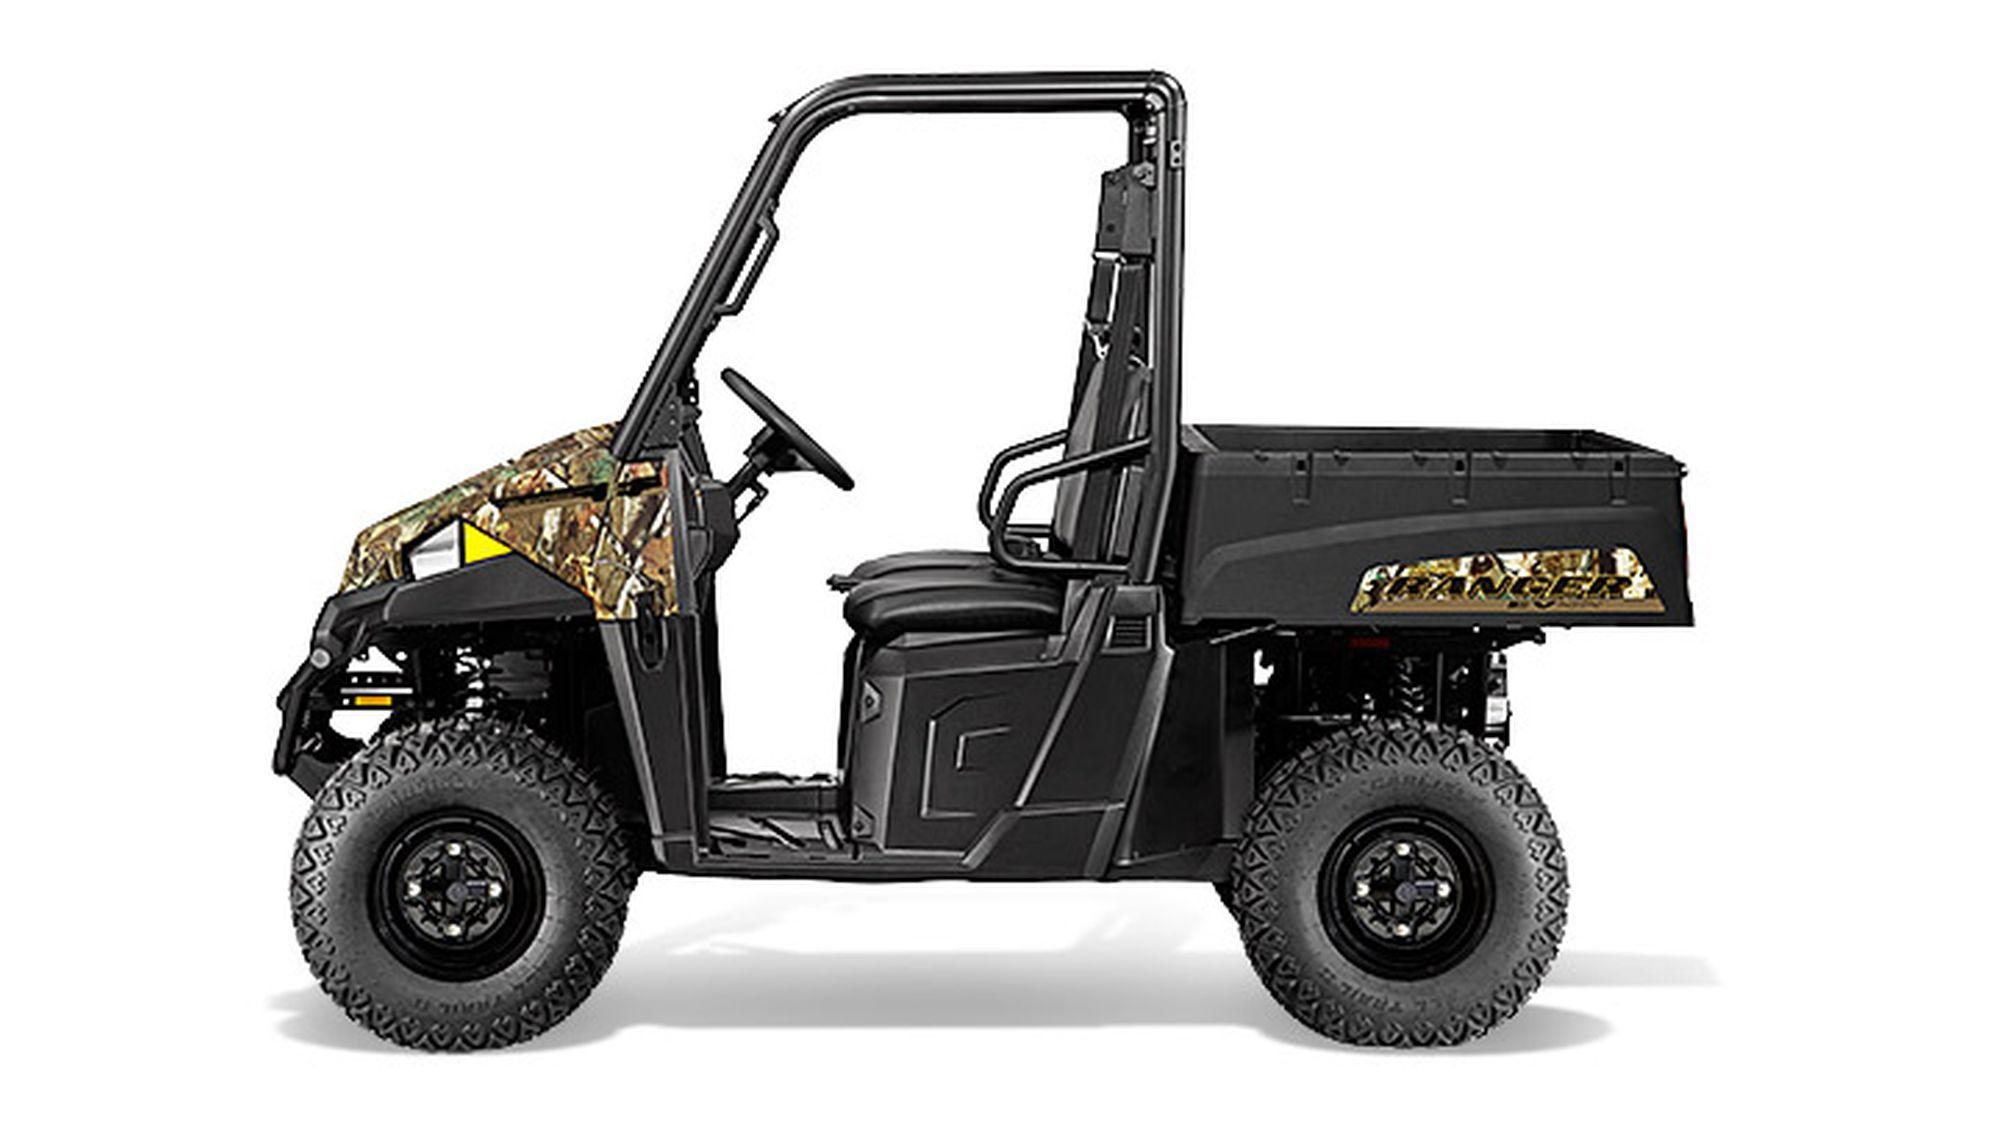 ranger polaris 700 fuel pump autos post. Black Bedroom Furniture Sets. Home Design Ideas